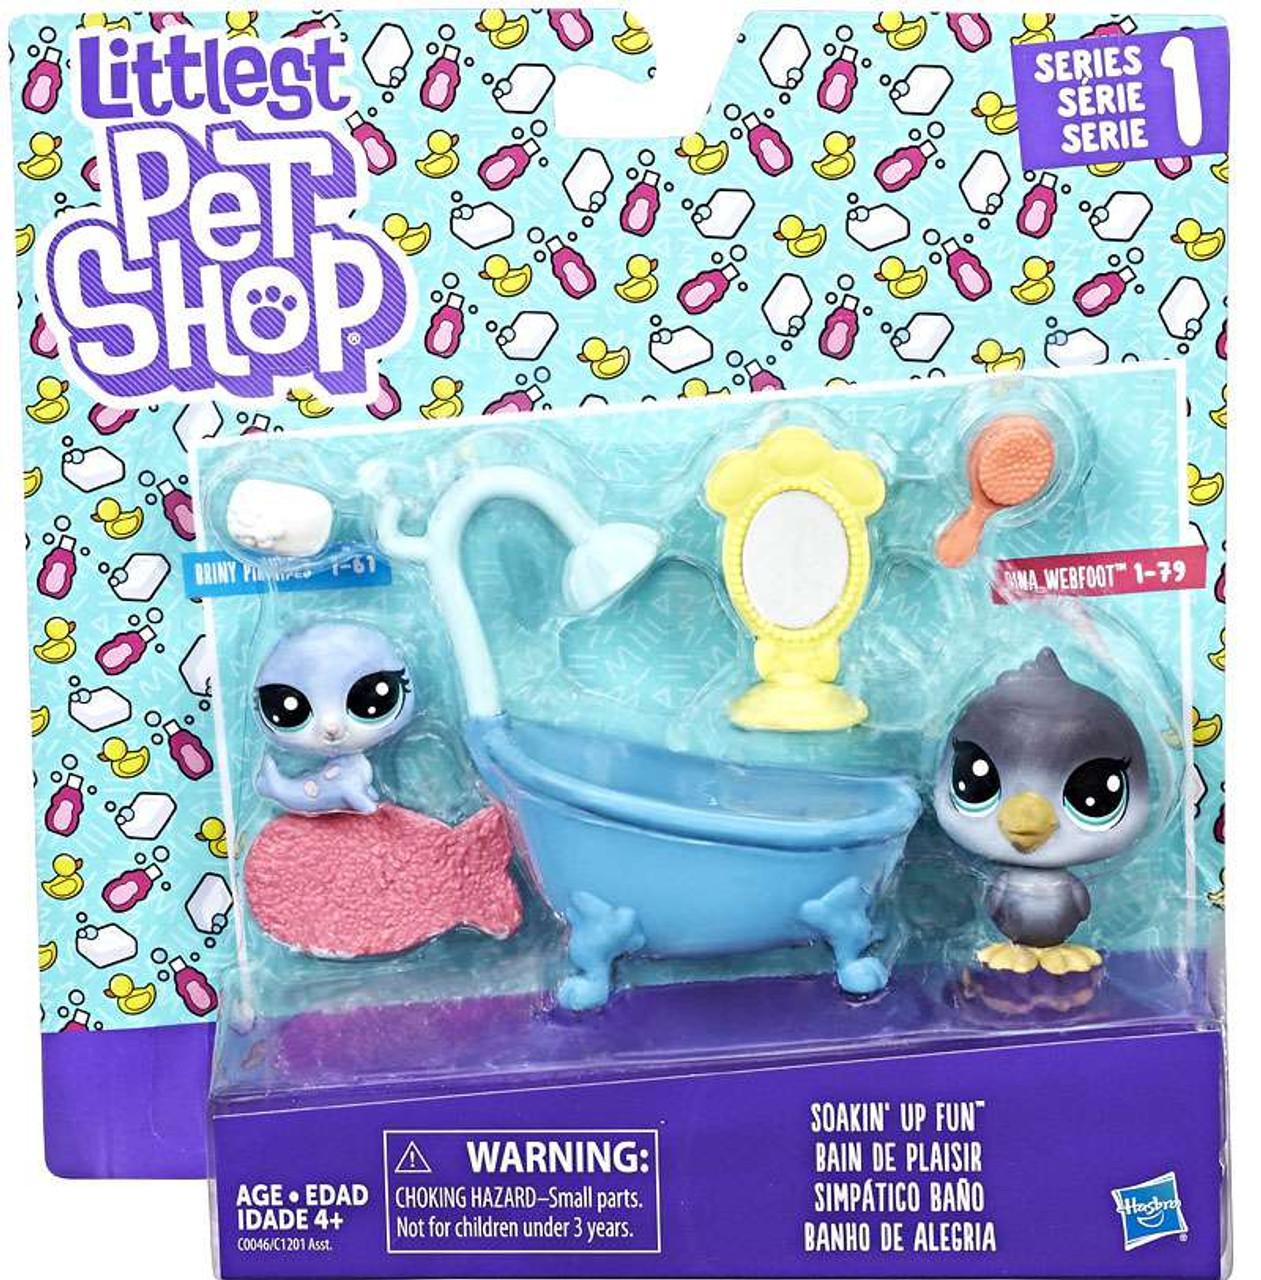 littlest pet shop series 1 bath time fun mini figure 2 pack hasbro